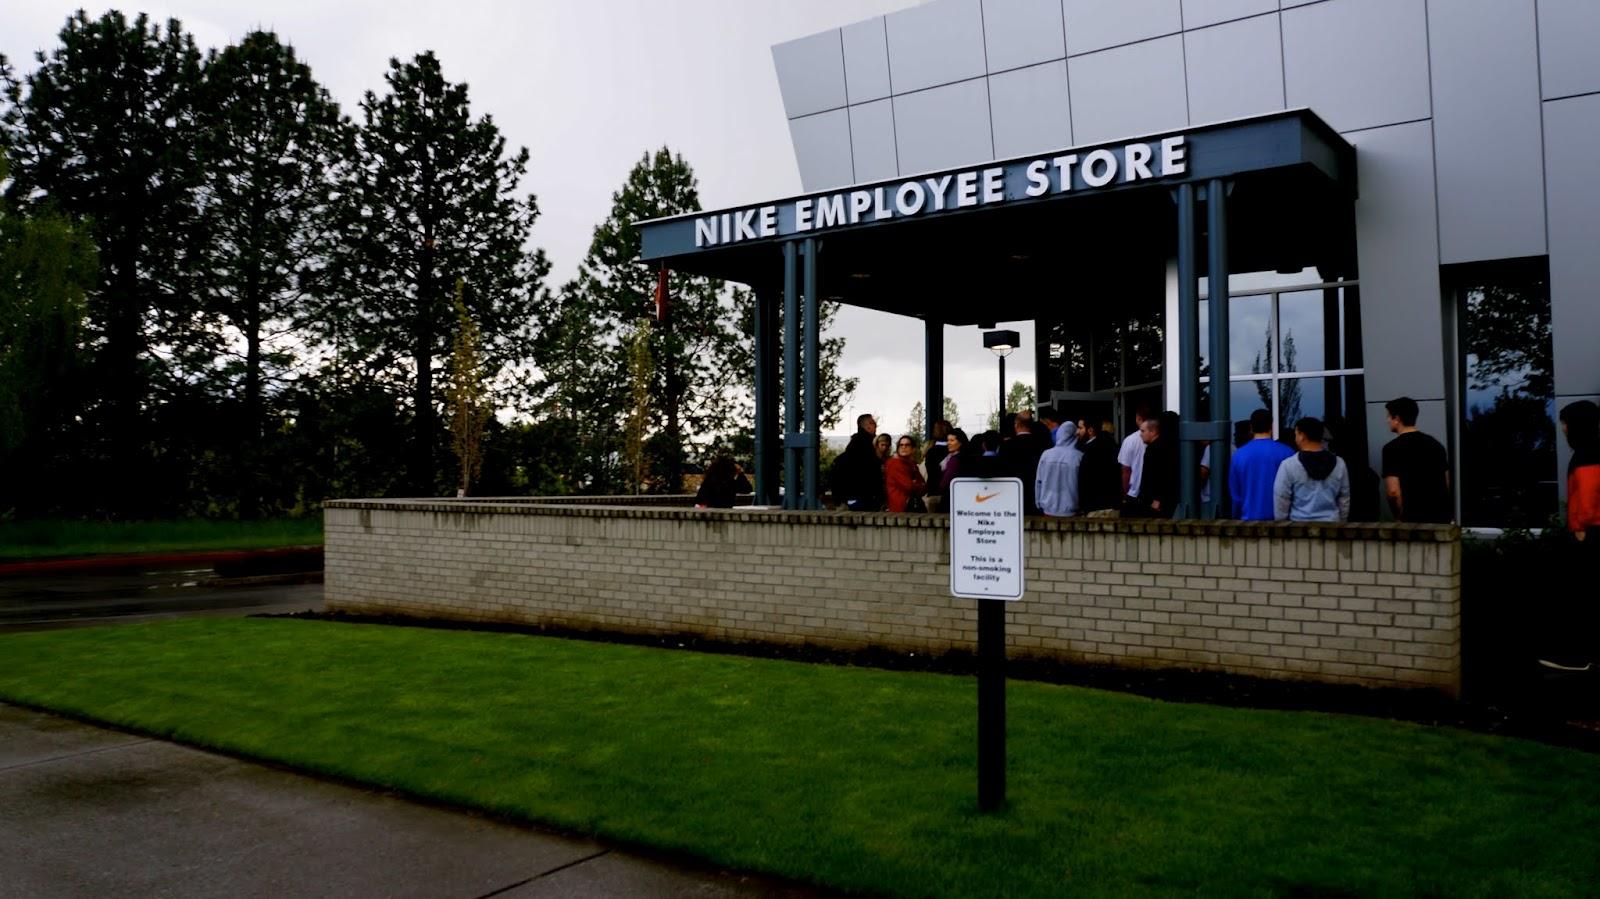 nike employee store pass cz nike employee store pass